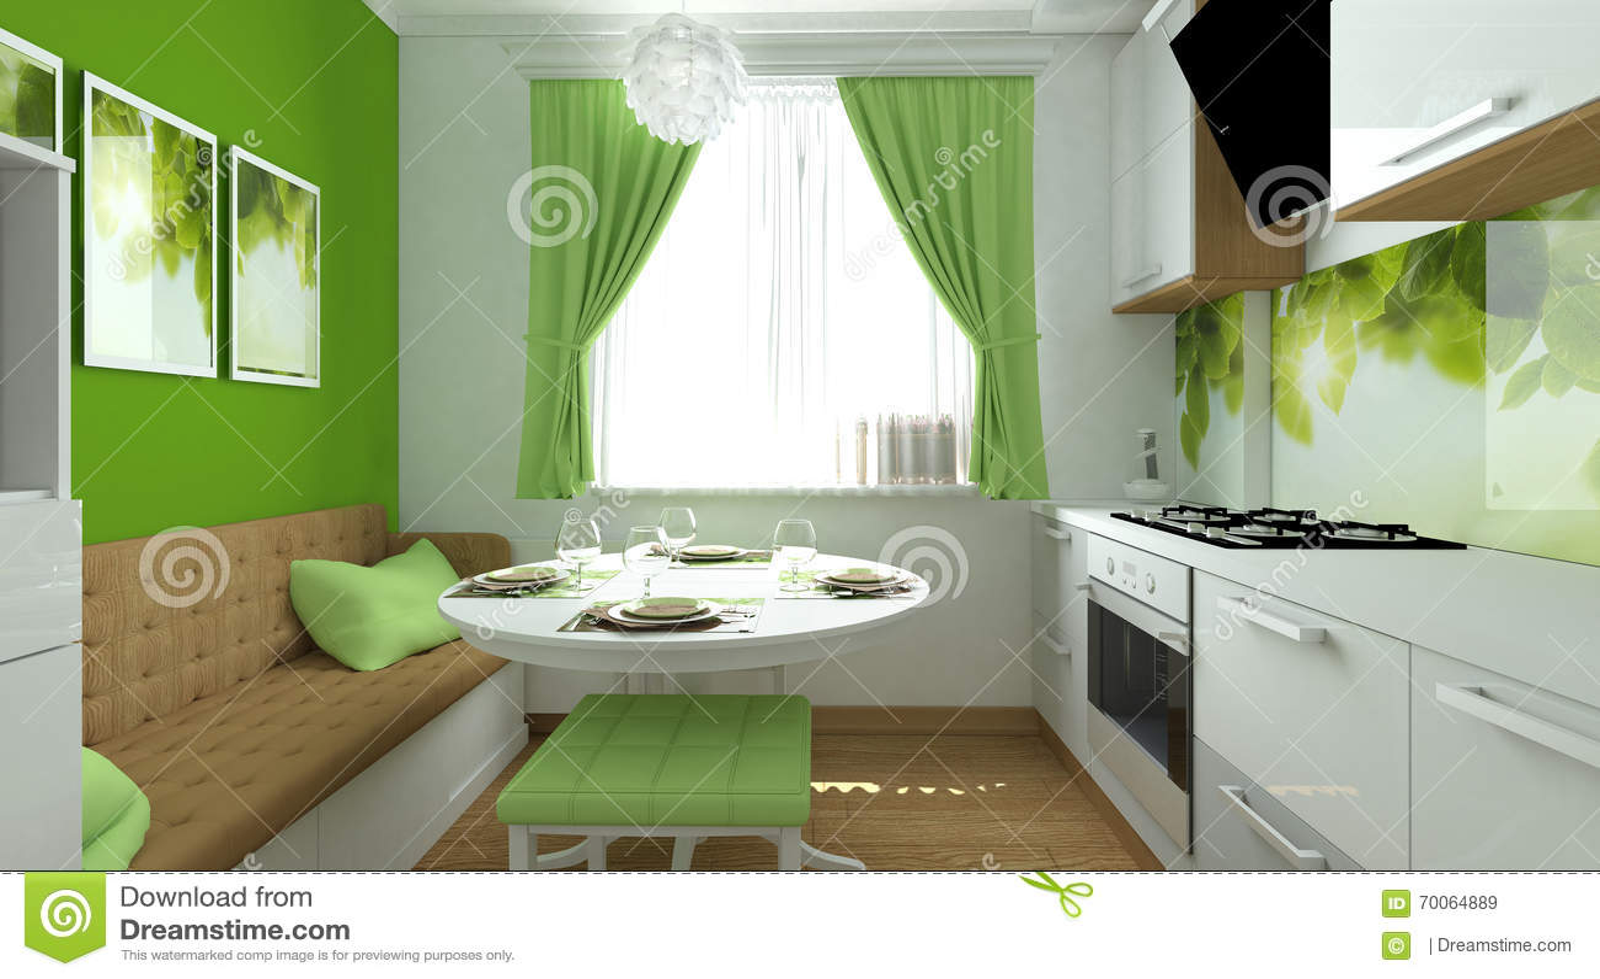 Groene Keuken Stock Foto Afbeelding 70064889